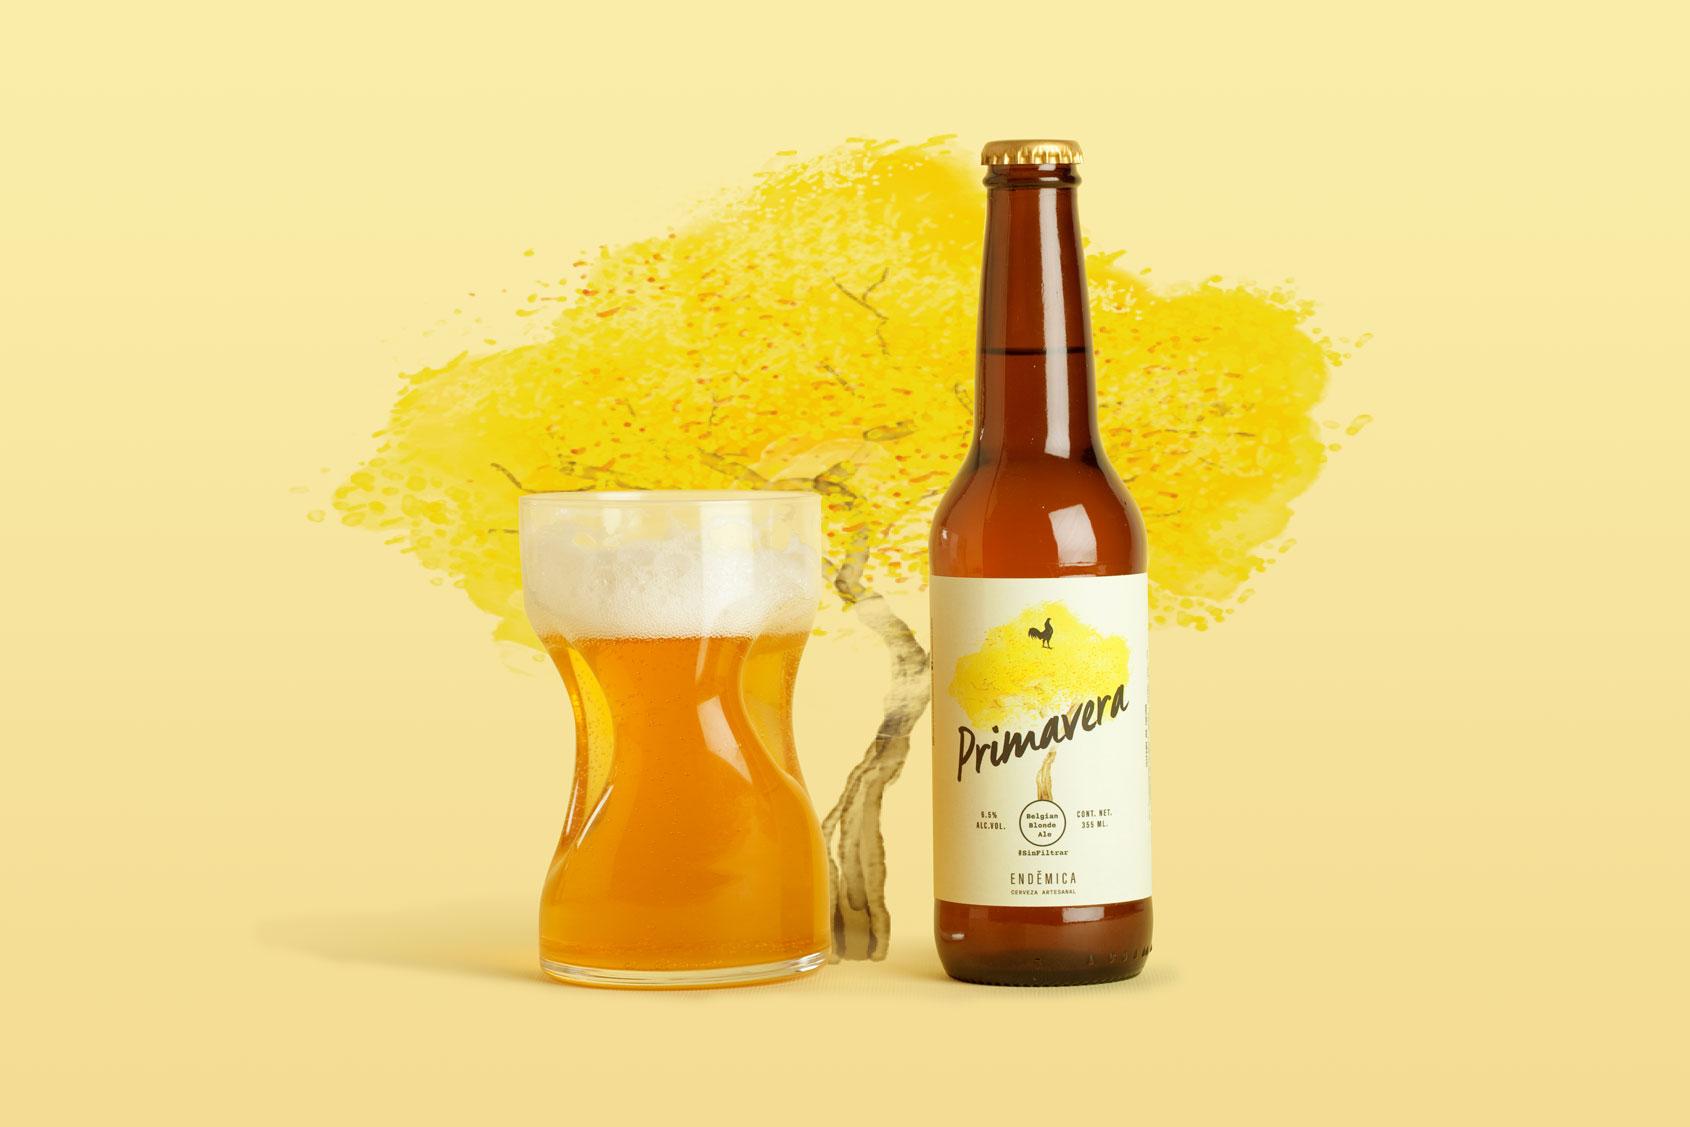 ENDEMICA-Primavera-served